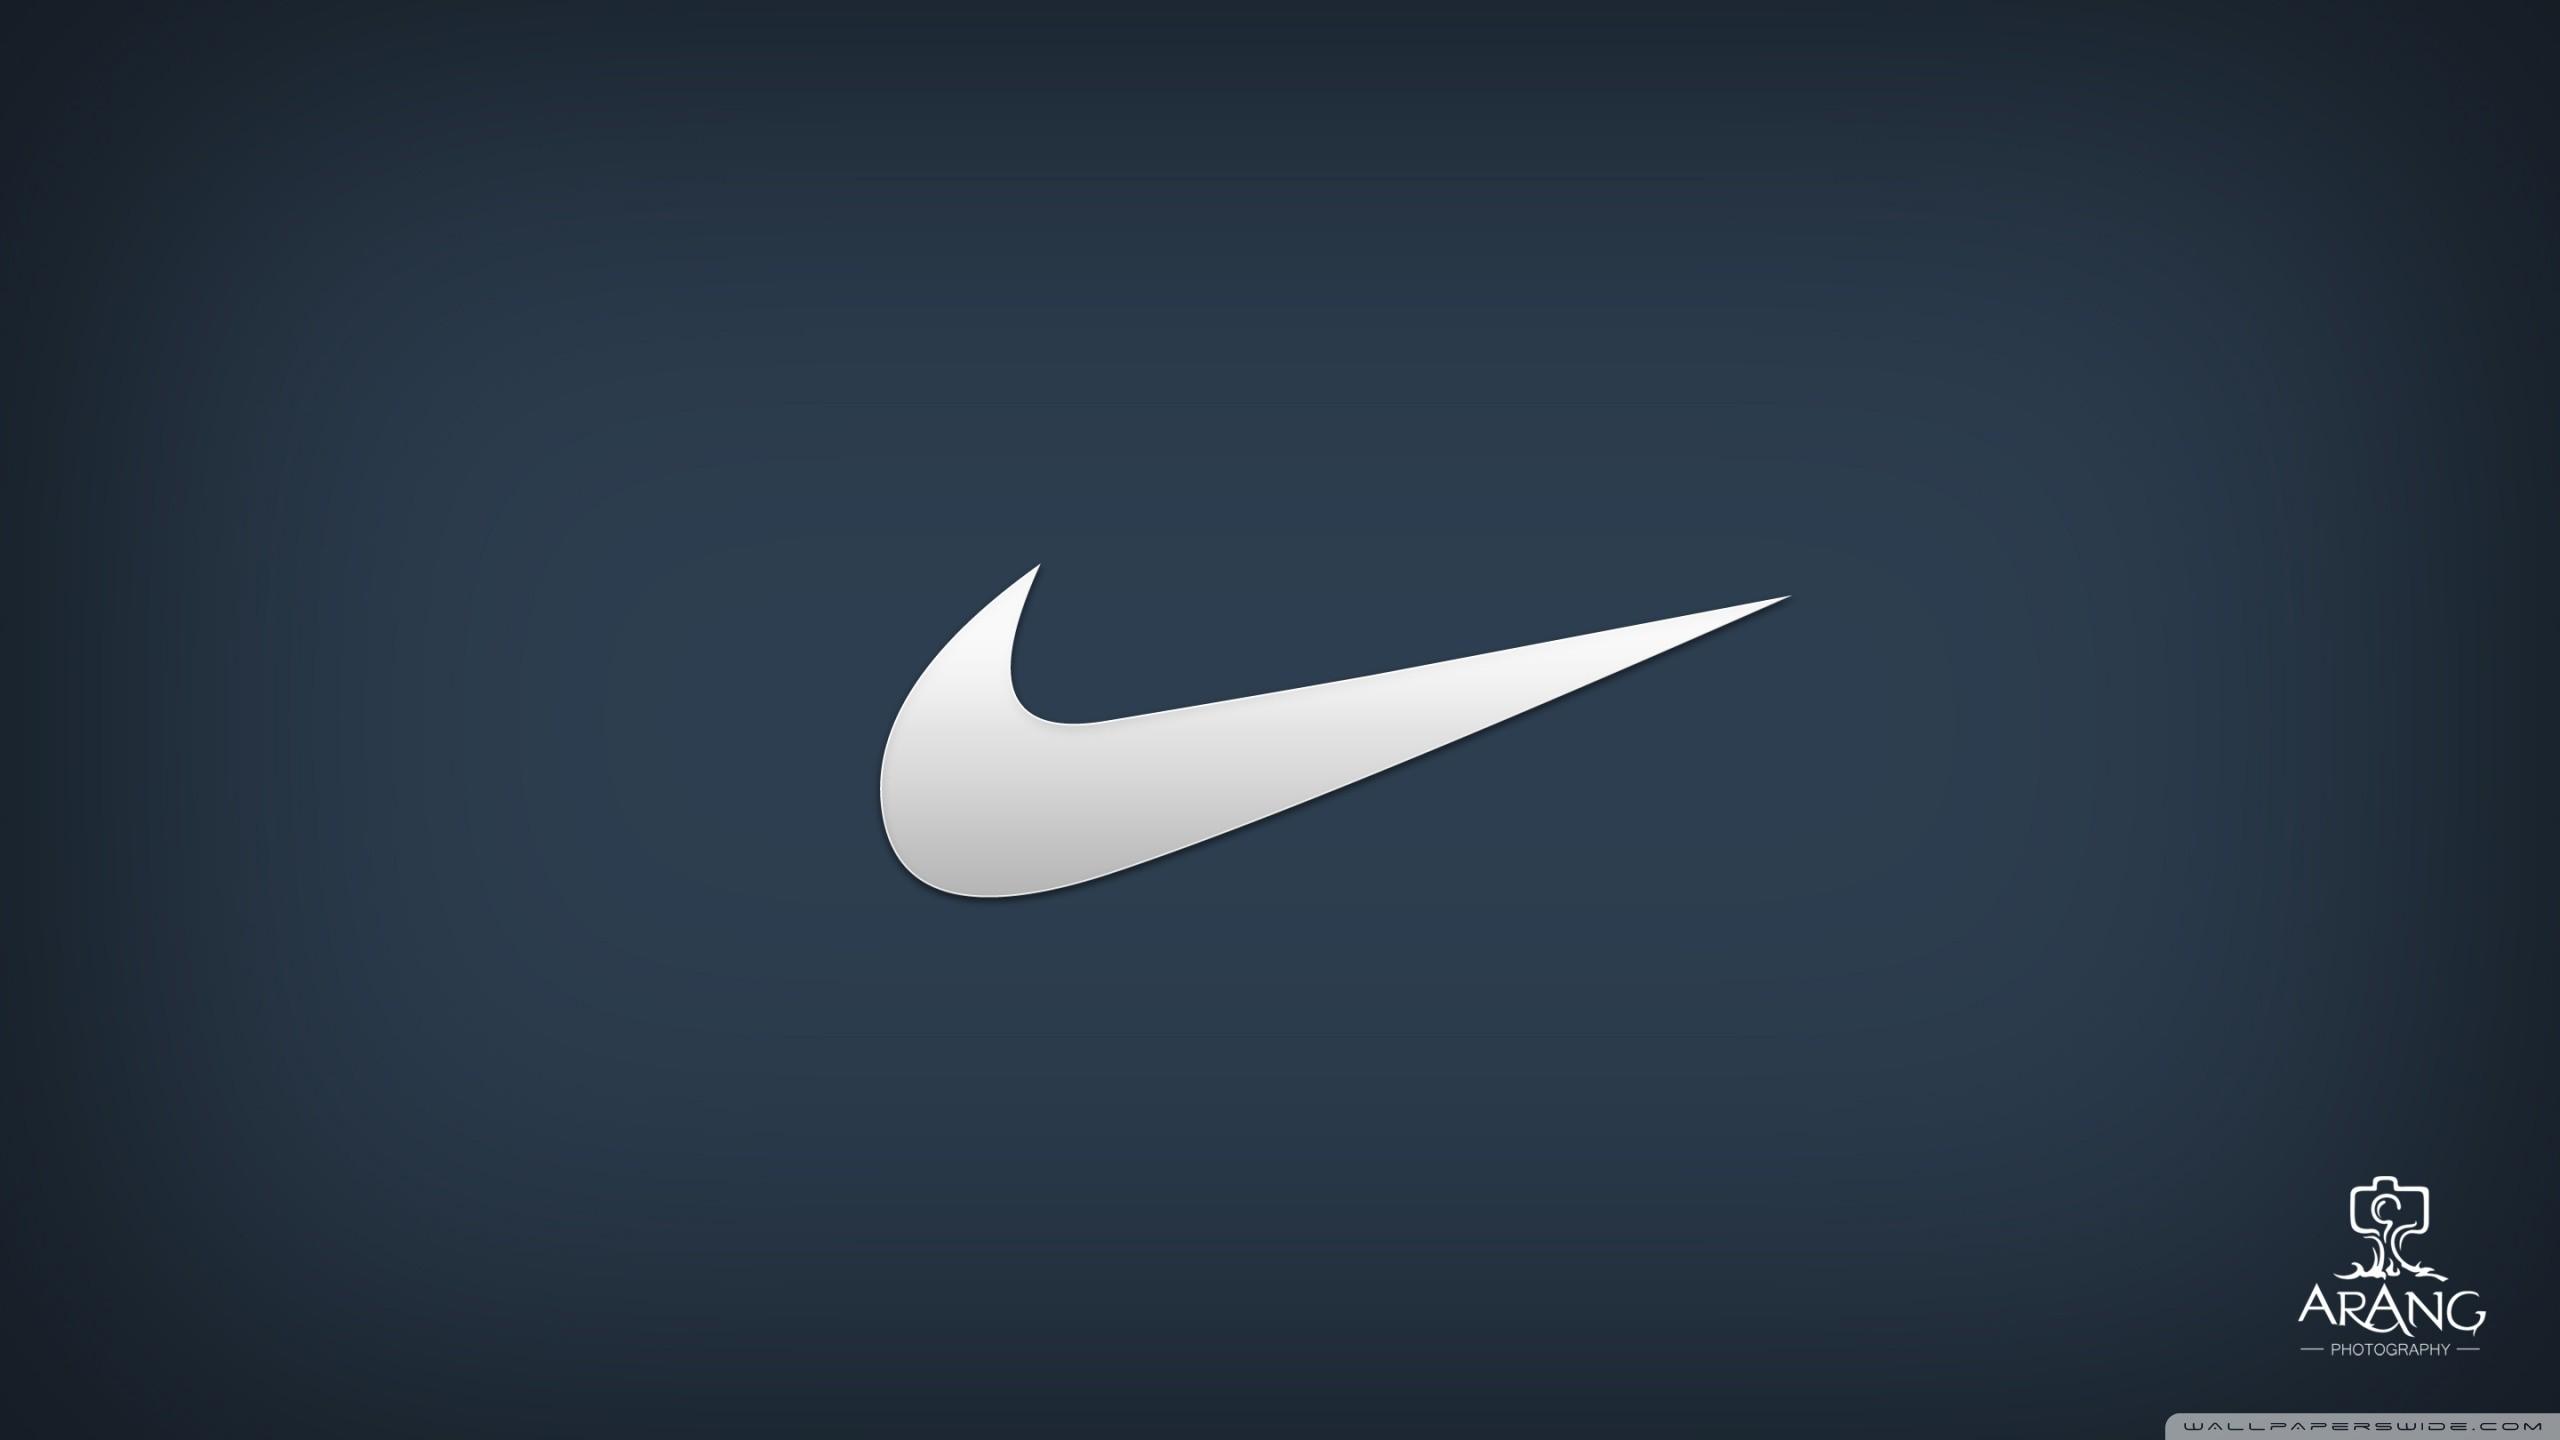 Nike Swoosh Wallpaper 58 Pictures